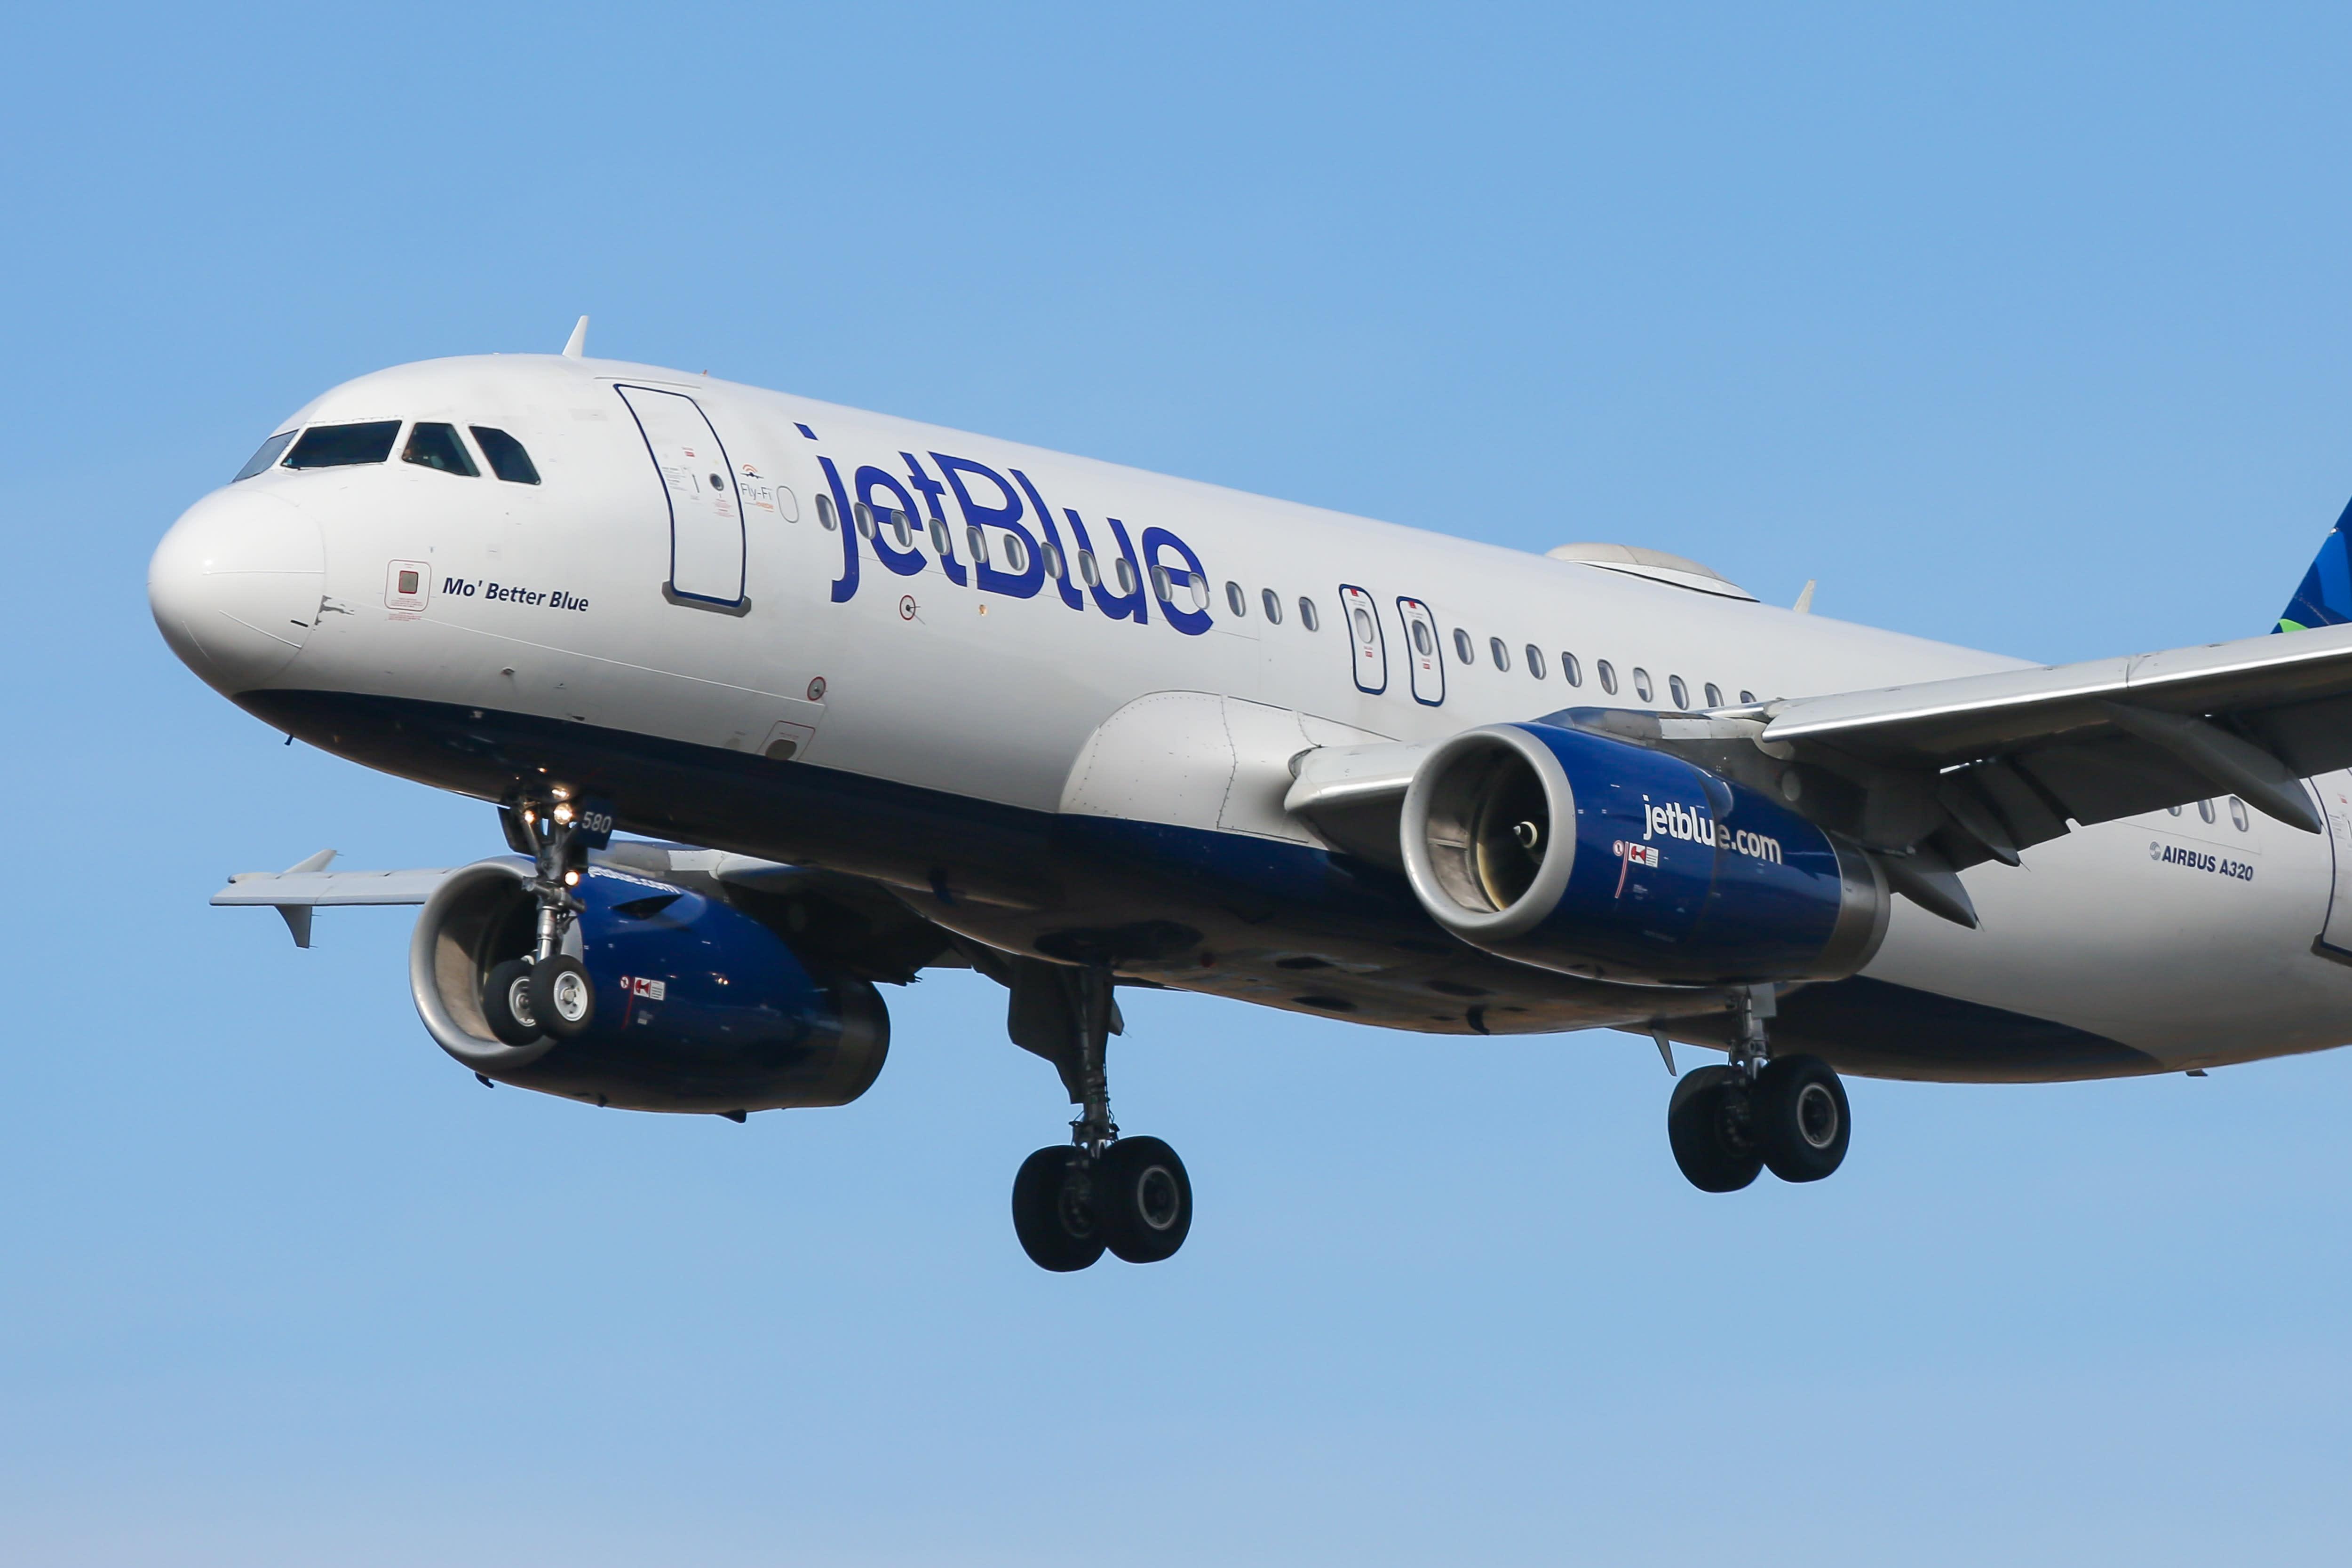 JetBlue cuts schedule to essential flights as coronavirus spreads